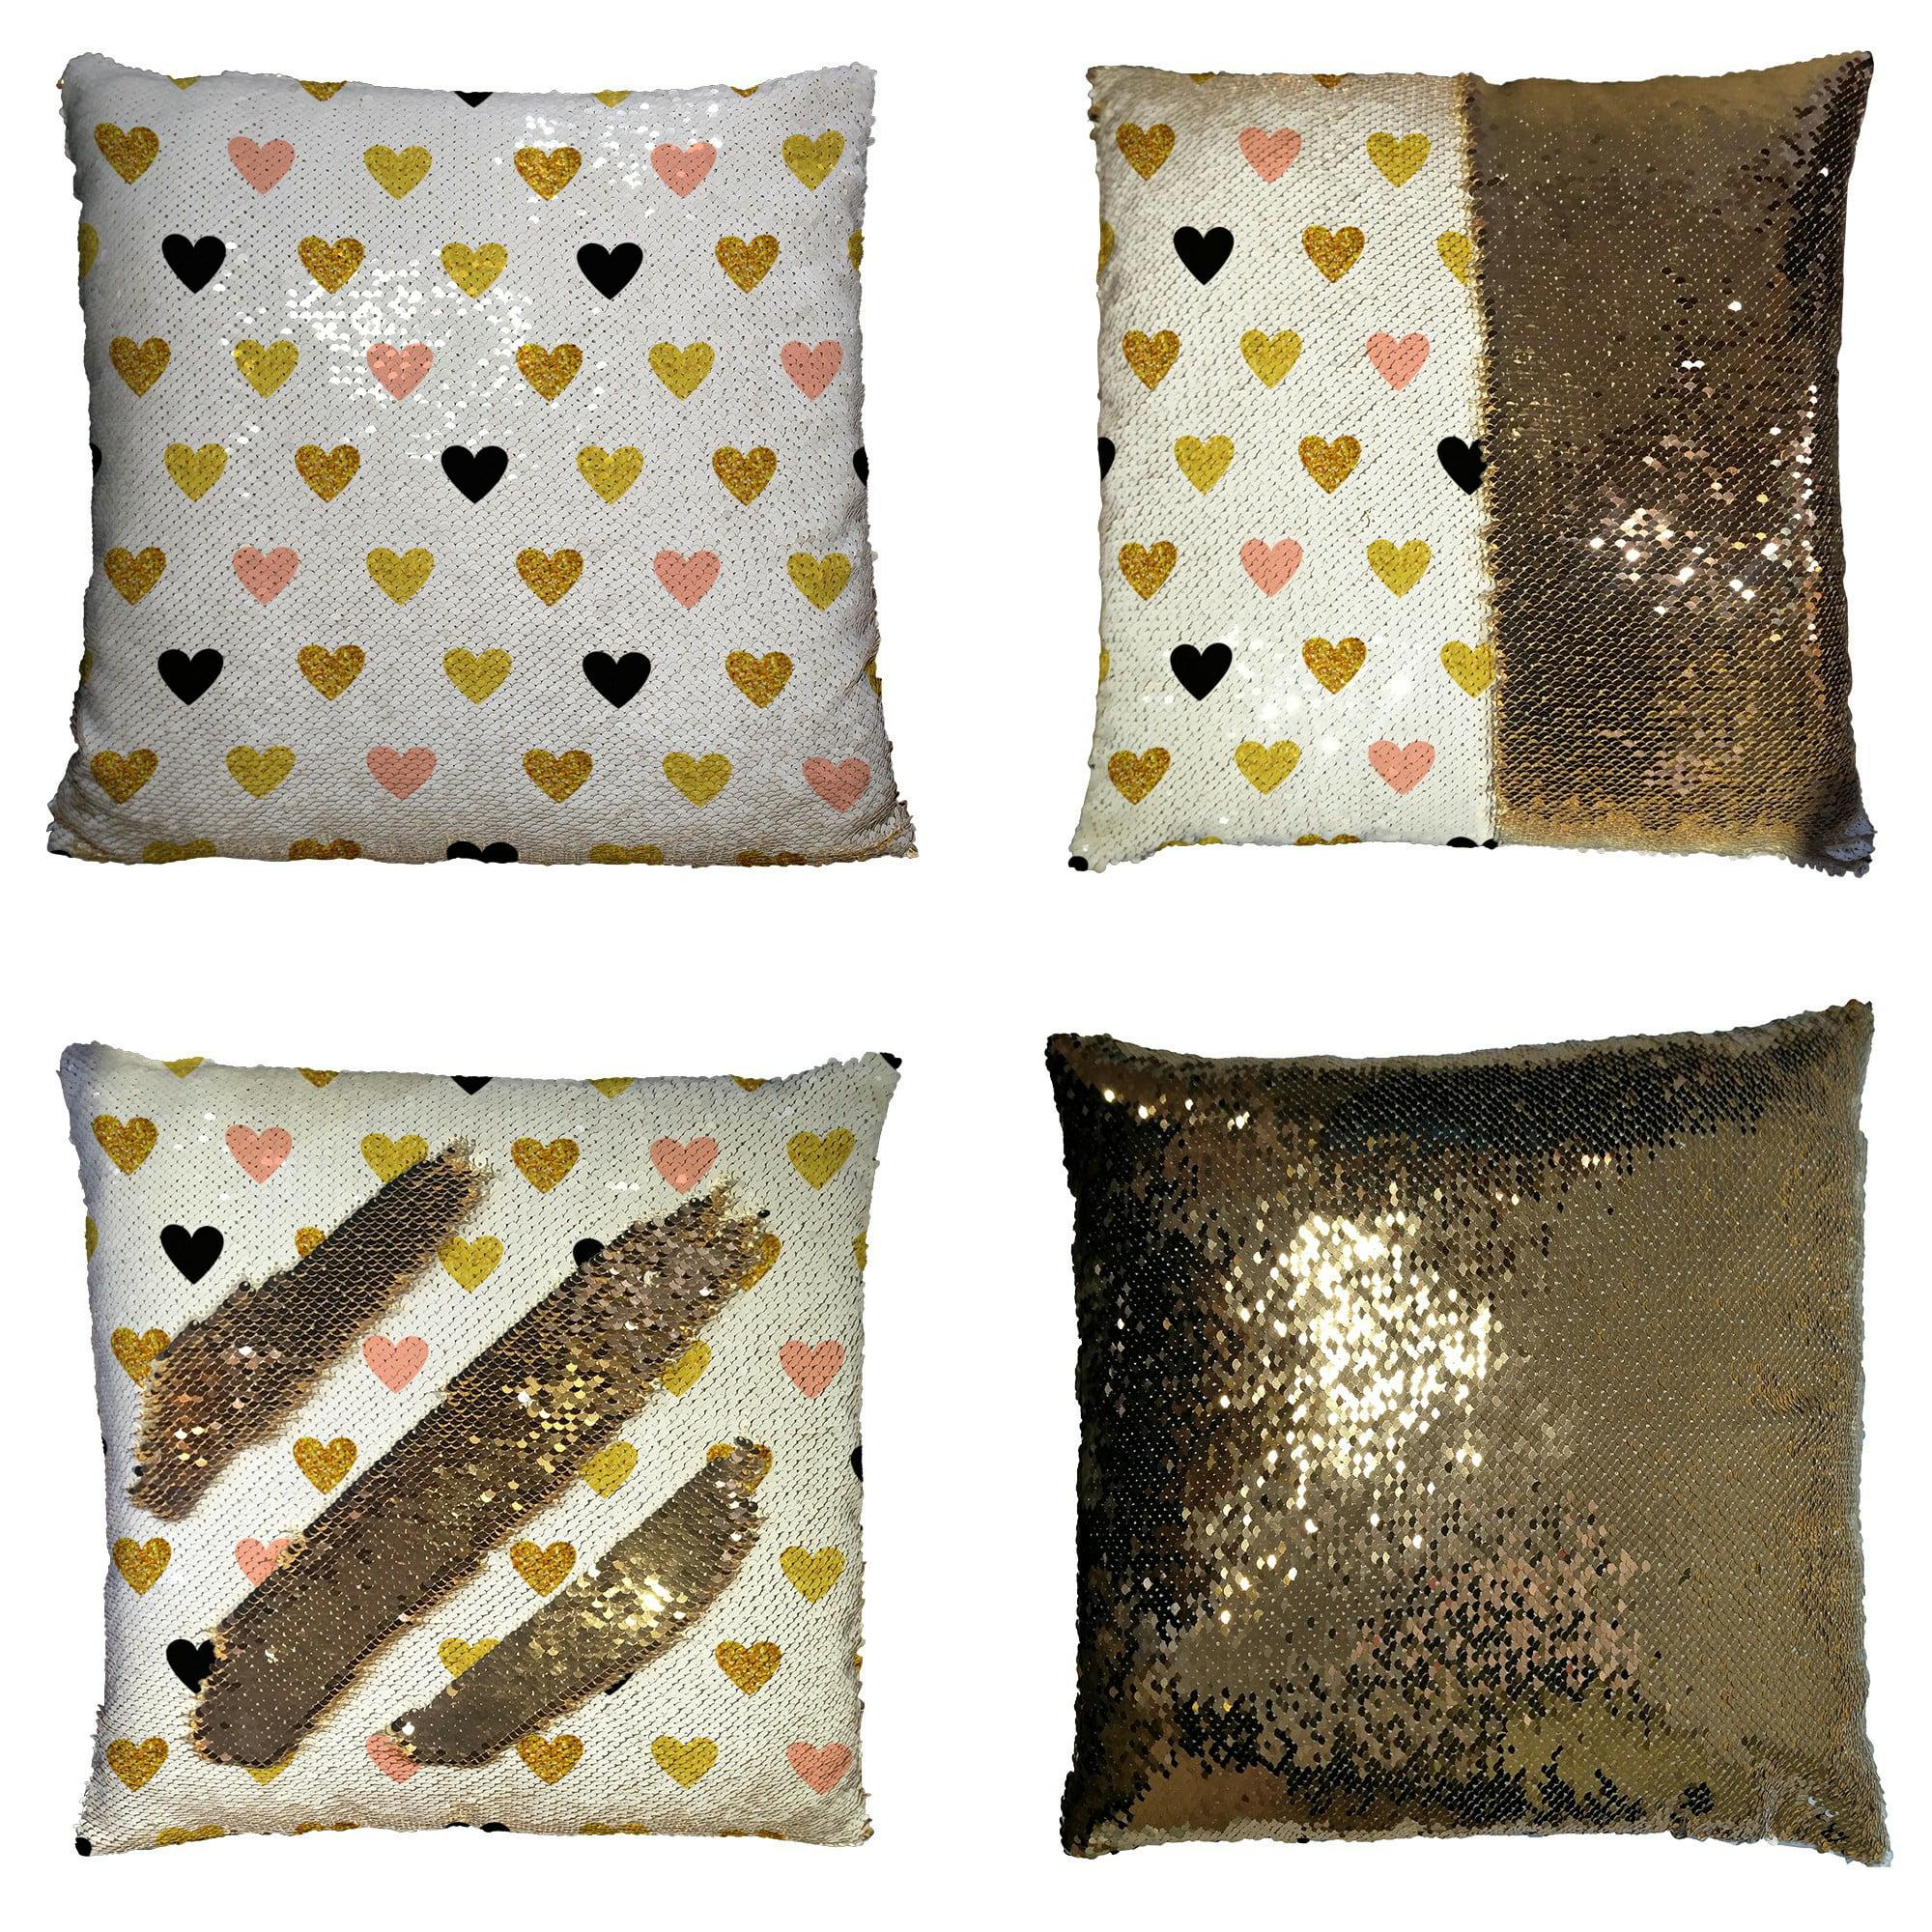 Eczjnt Hearts Rose Gold Black Gold Hearts Sparkles Pillow Case Home Decor Cushion Cover 16x16 Inch Walmart Com Walmart Com